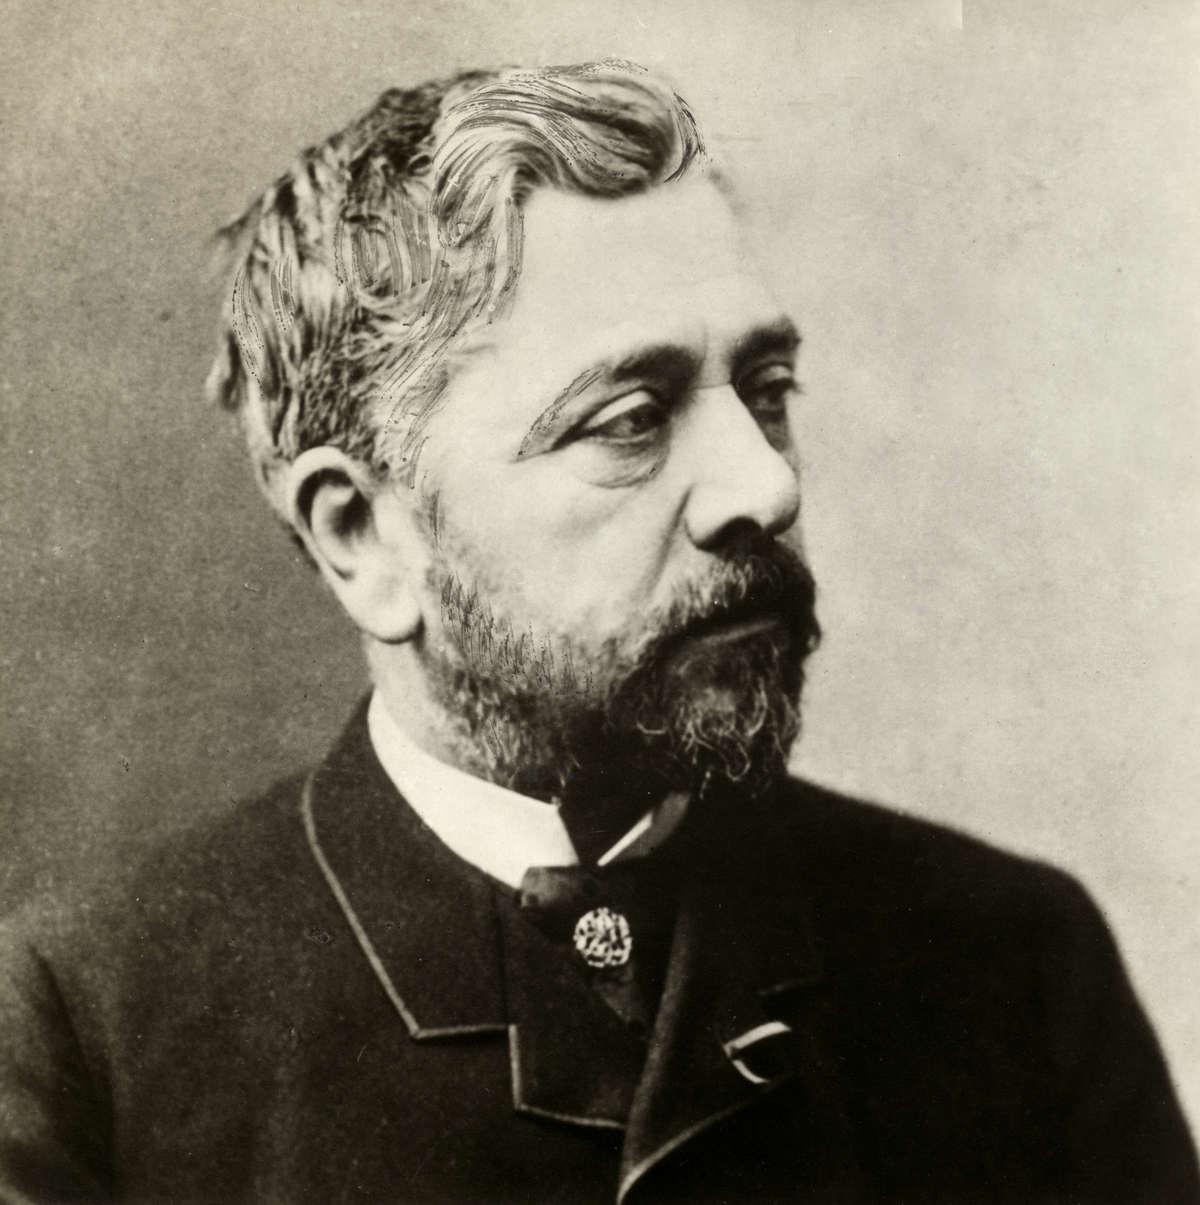 Alexandre gustave eiffel 1832 1923 frans architect for Eiffel architect